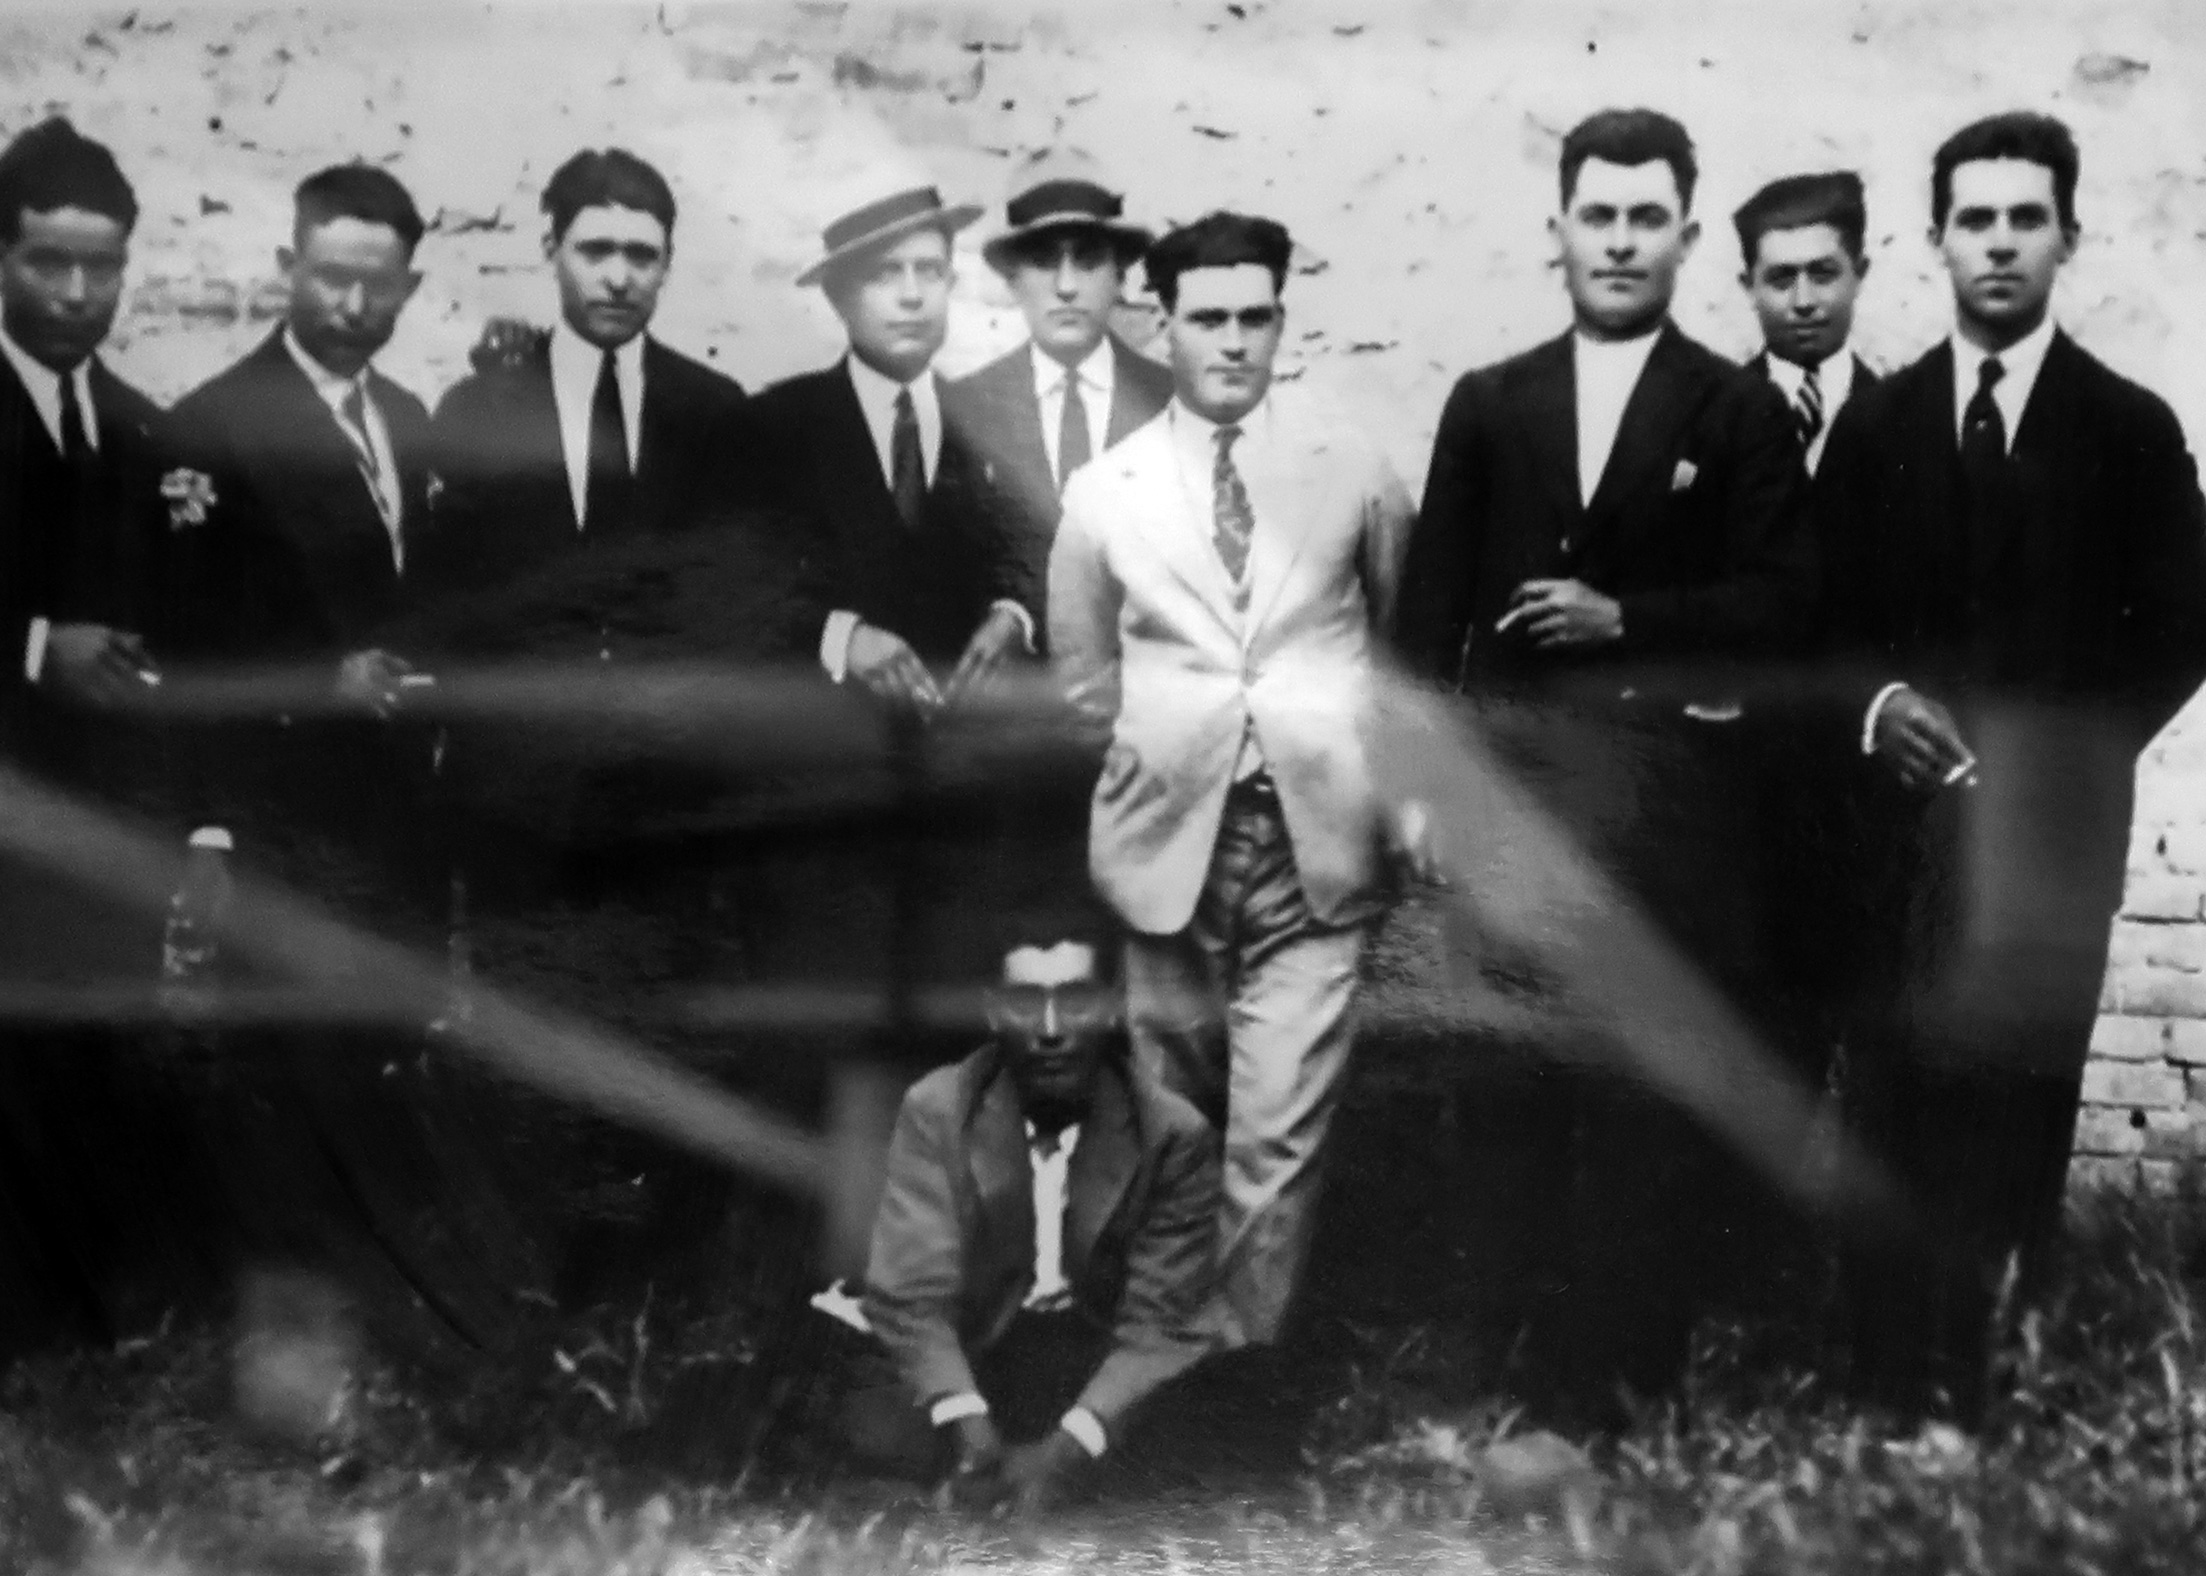 Sacramone Family members, circa 1930